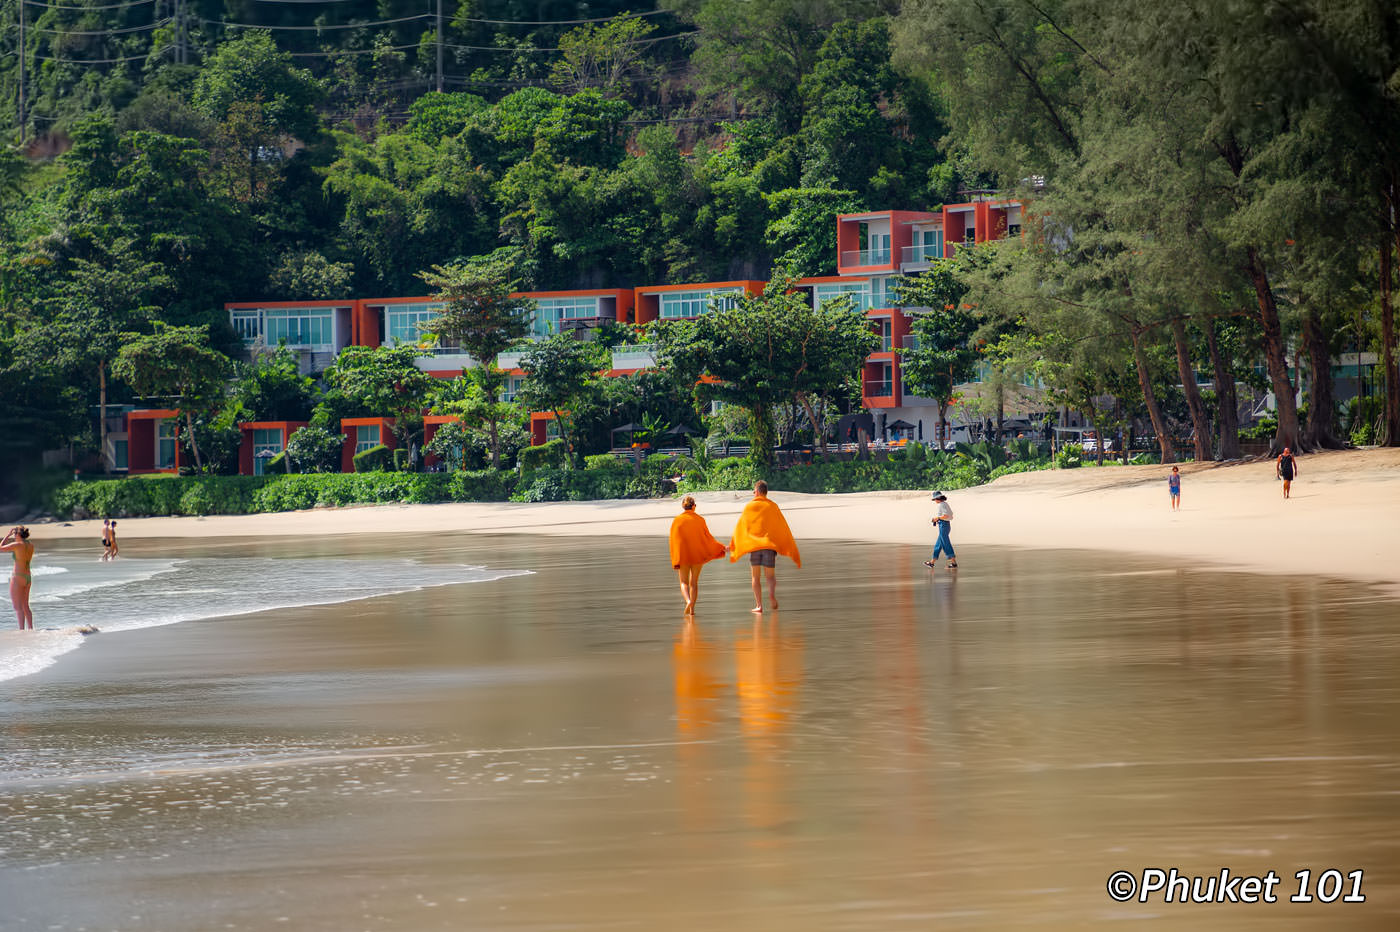 Novotel Phuket Kamala Beach – An affordable hotel right on the beach!